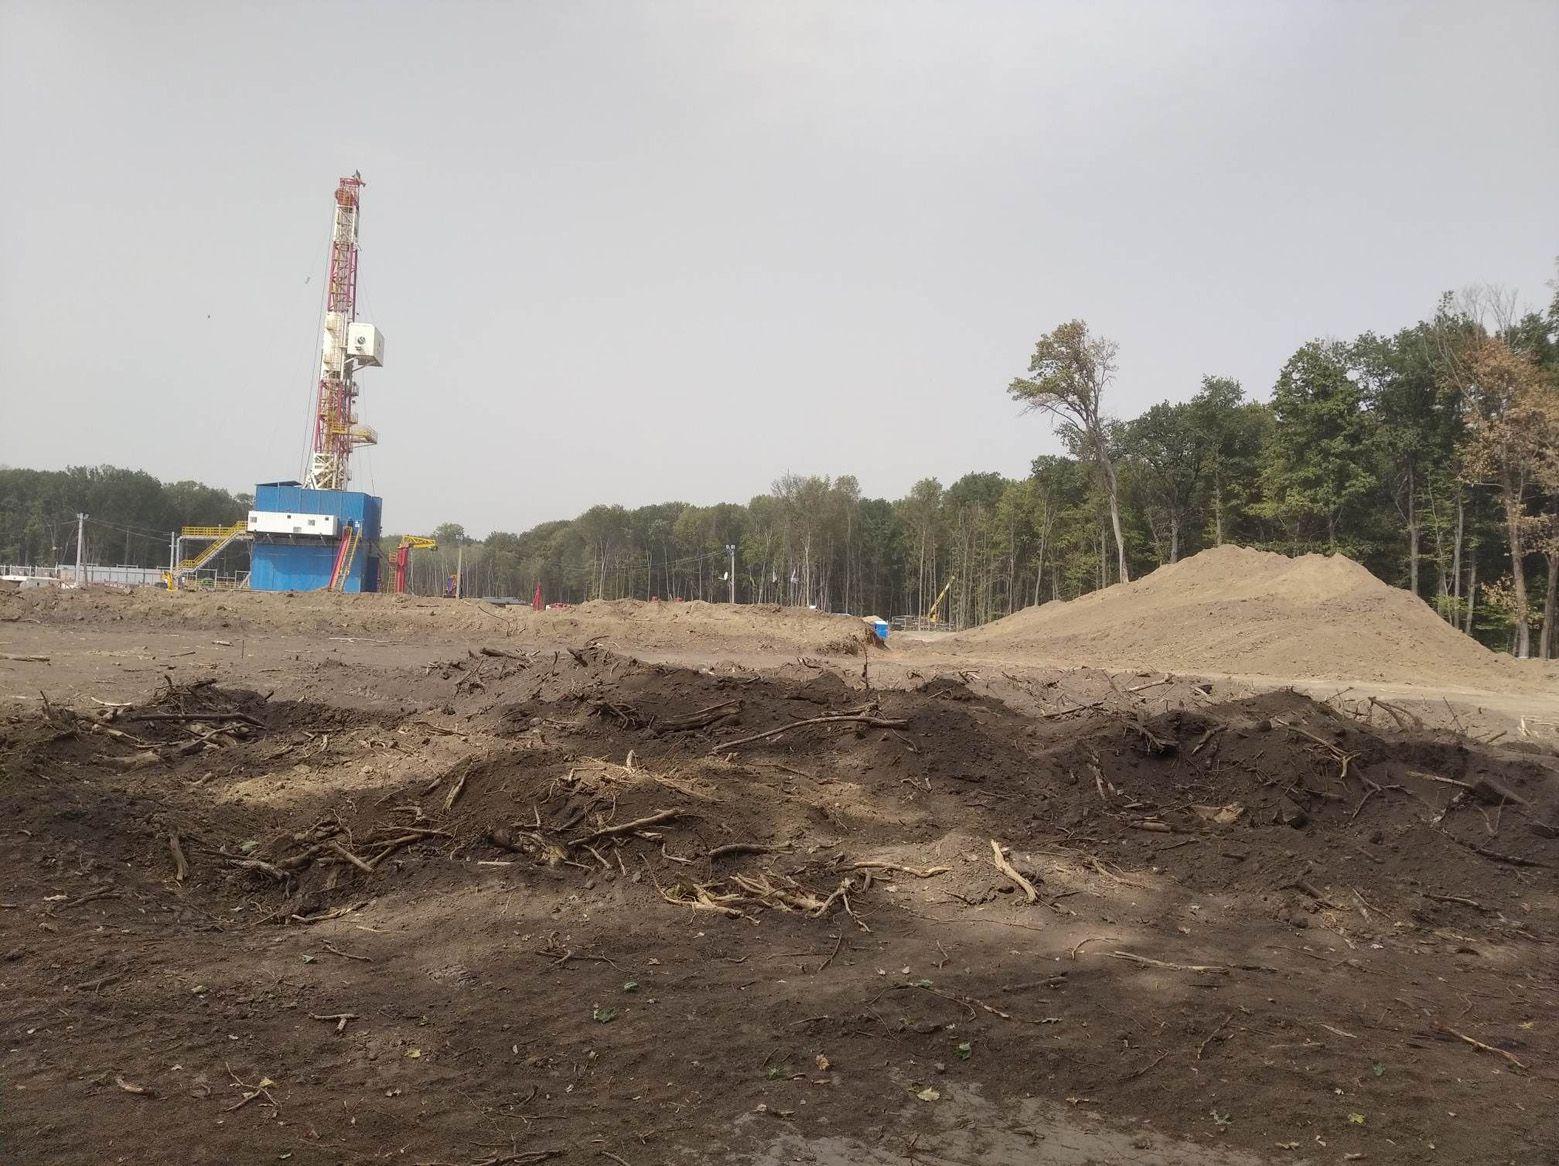 Комишнянське скіфське городище, зруйноване геологами, отримало статус пам'ятки